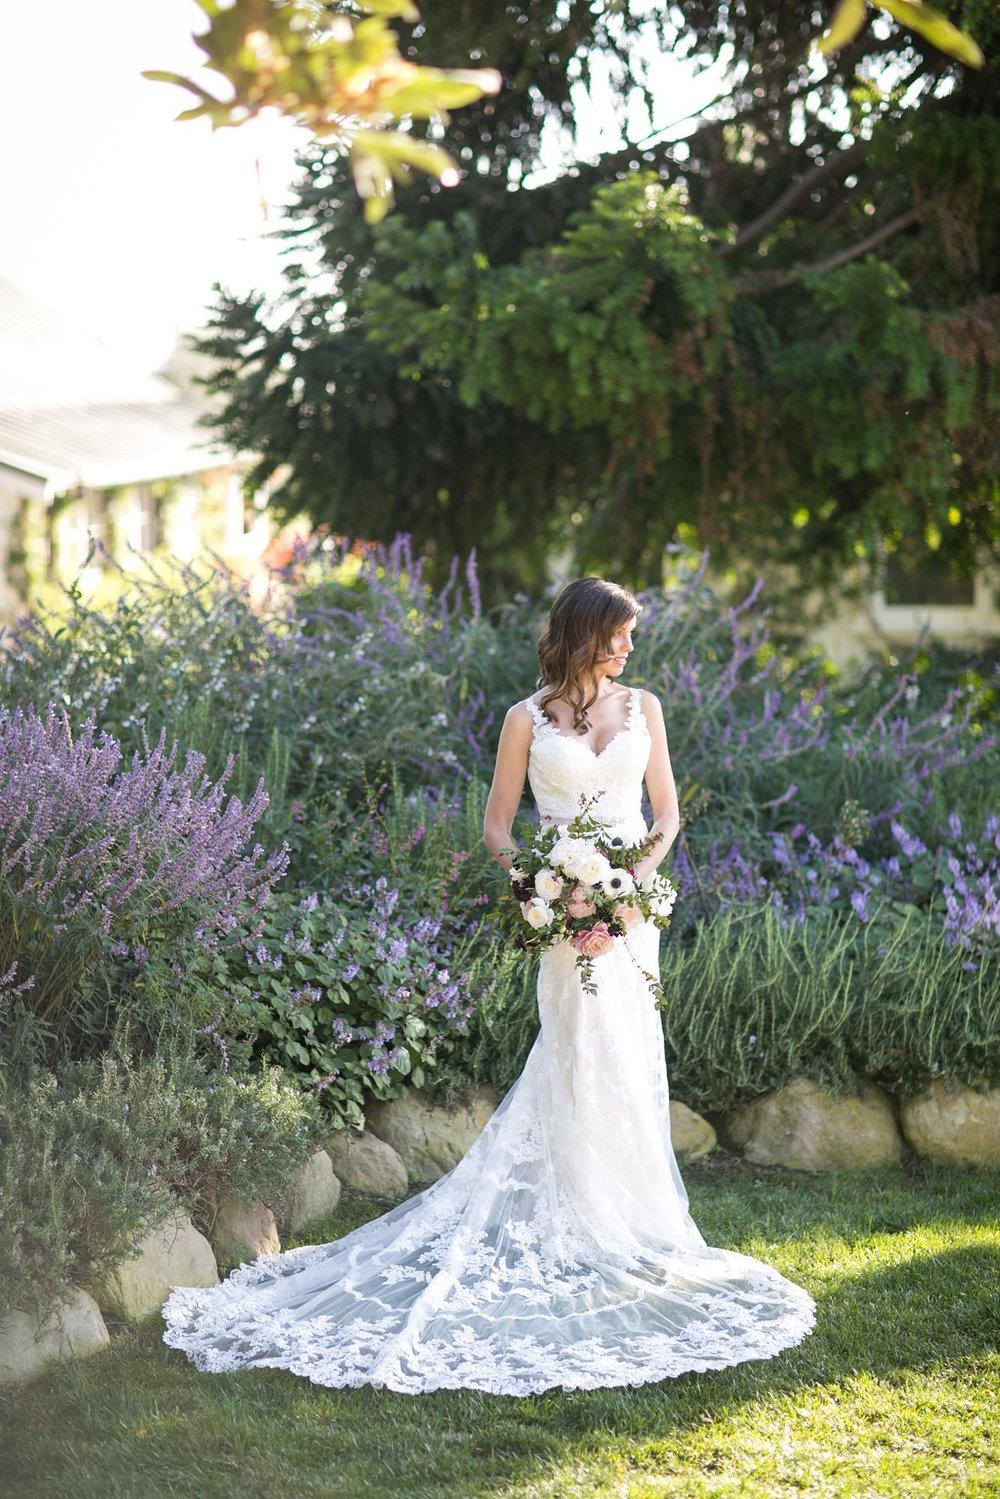 San Yisidro Ranch Wedding | Miki & Sonja Photography | mikiandsonja.comSan Yisidro Ranch Wedding | Miki & Sonja Photography | mikiandsonja.com